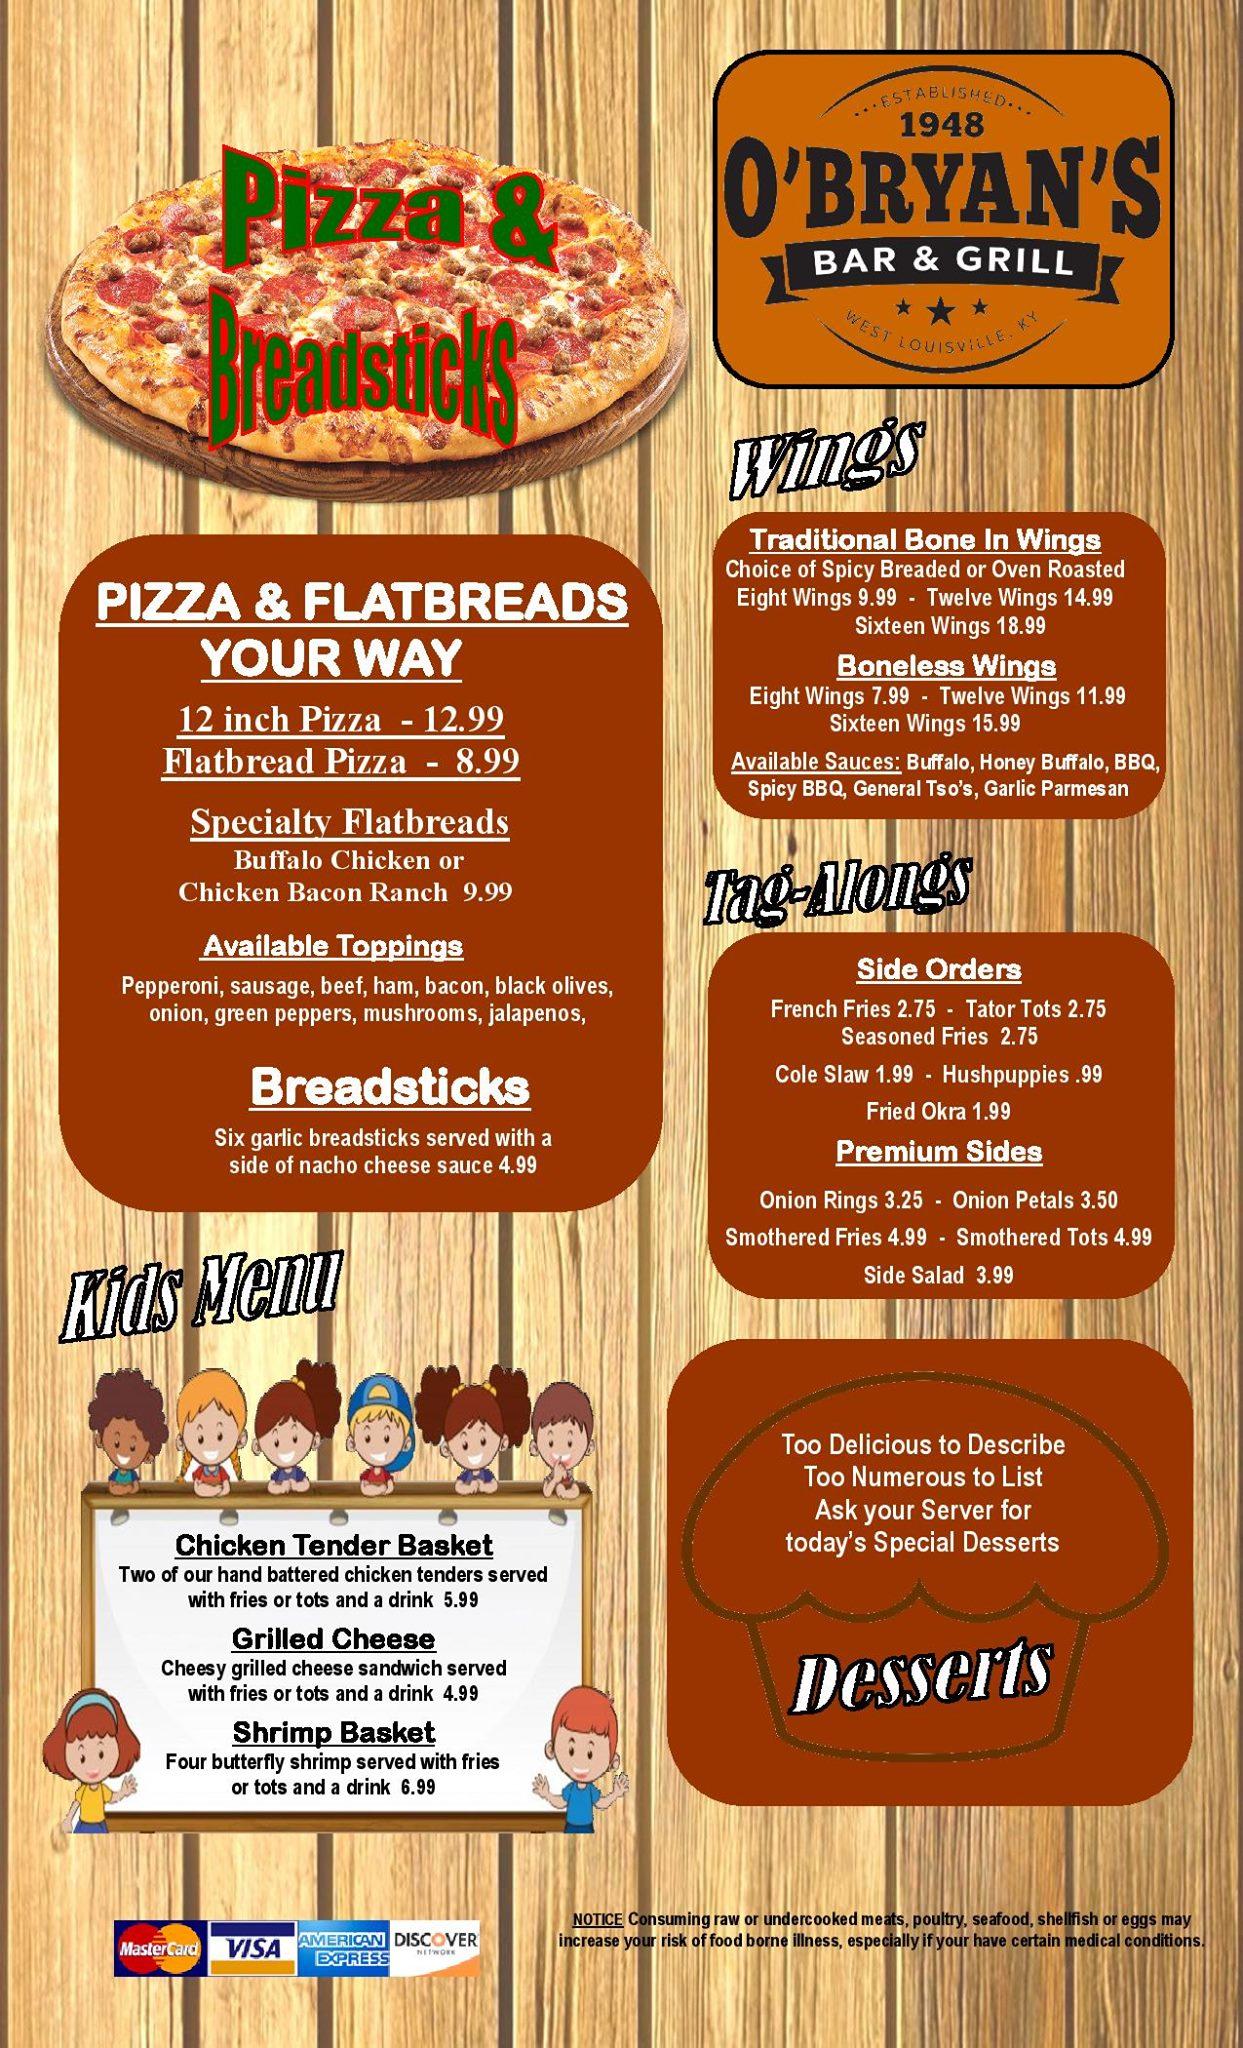 Obryans Bar And Grill General Menu